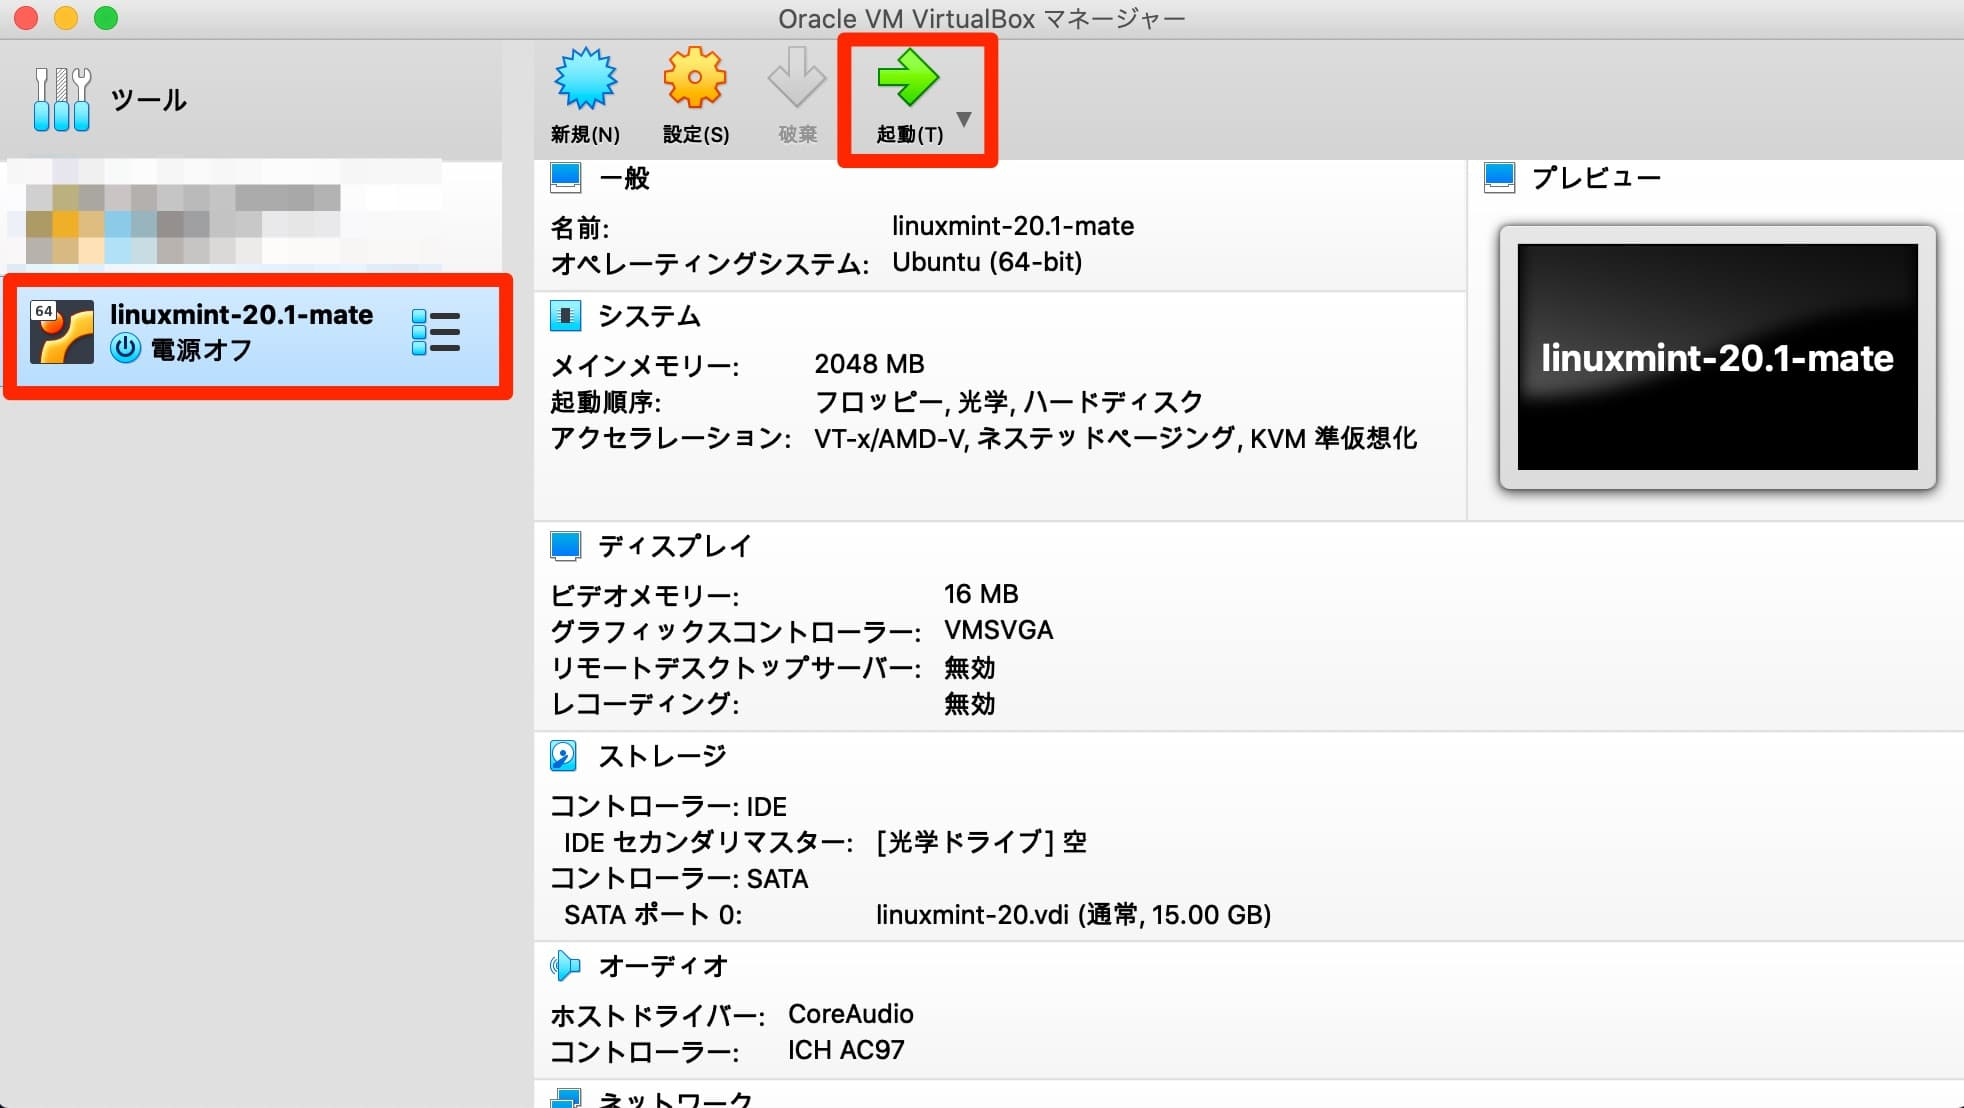 virtualboxからlinuxmintを起動